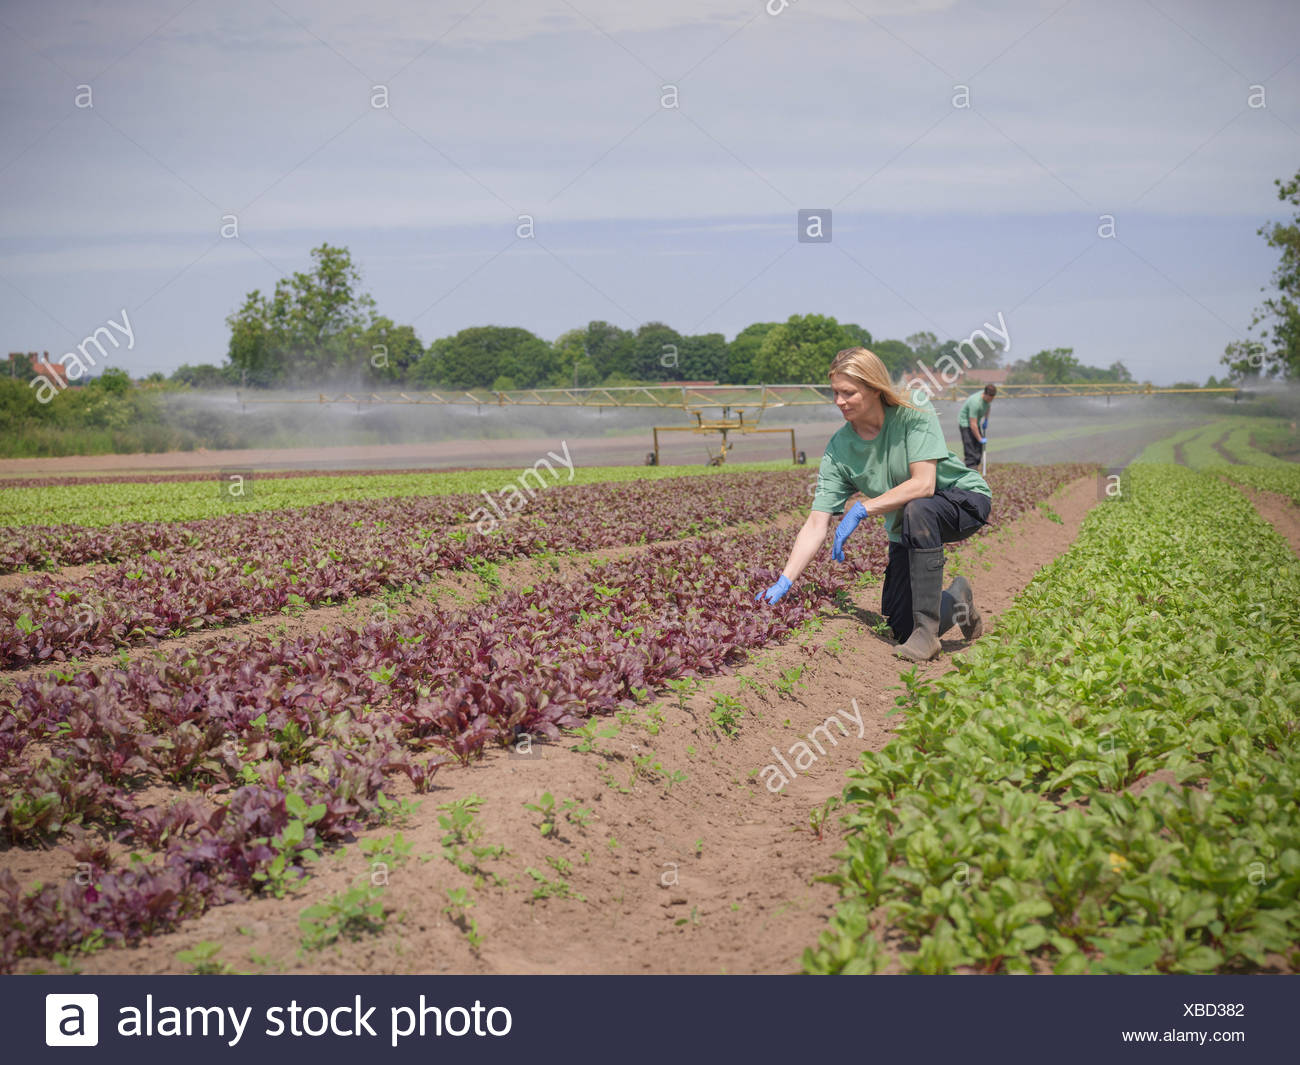 Woman inspecting salad crop - Stock Image